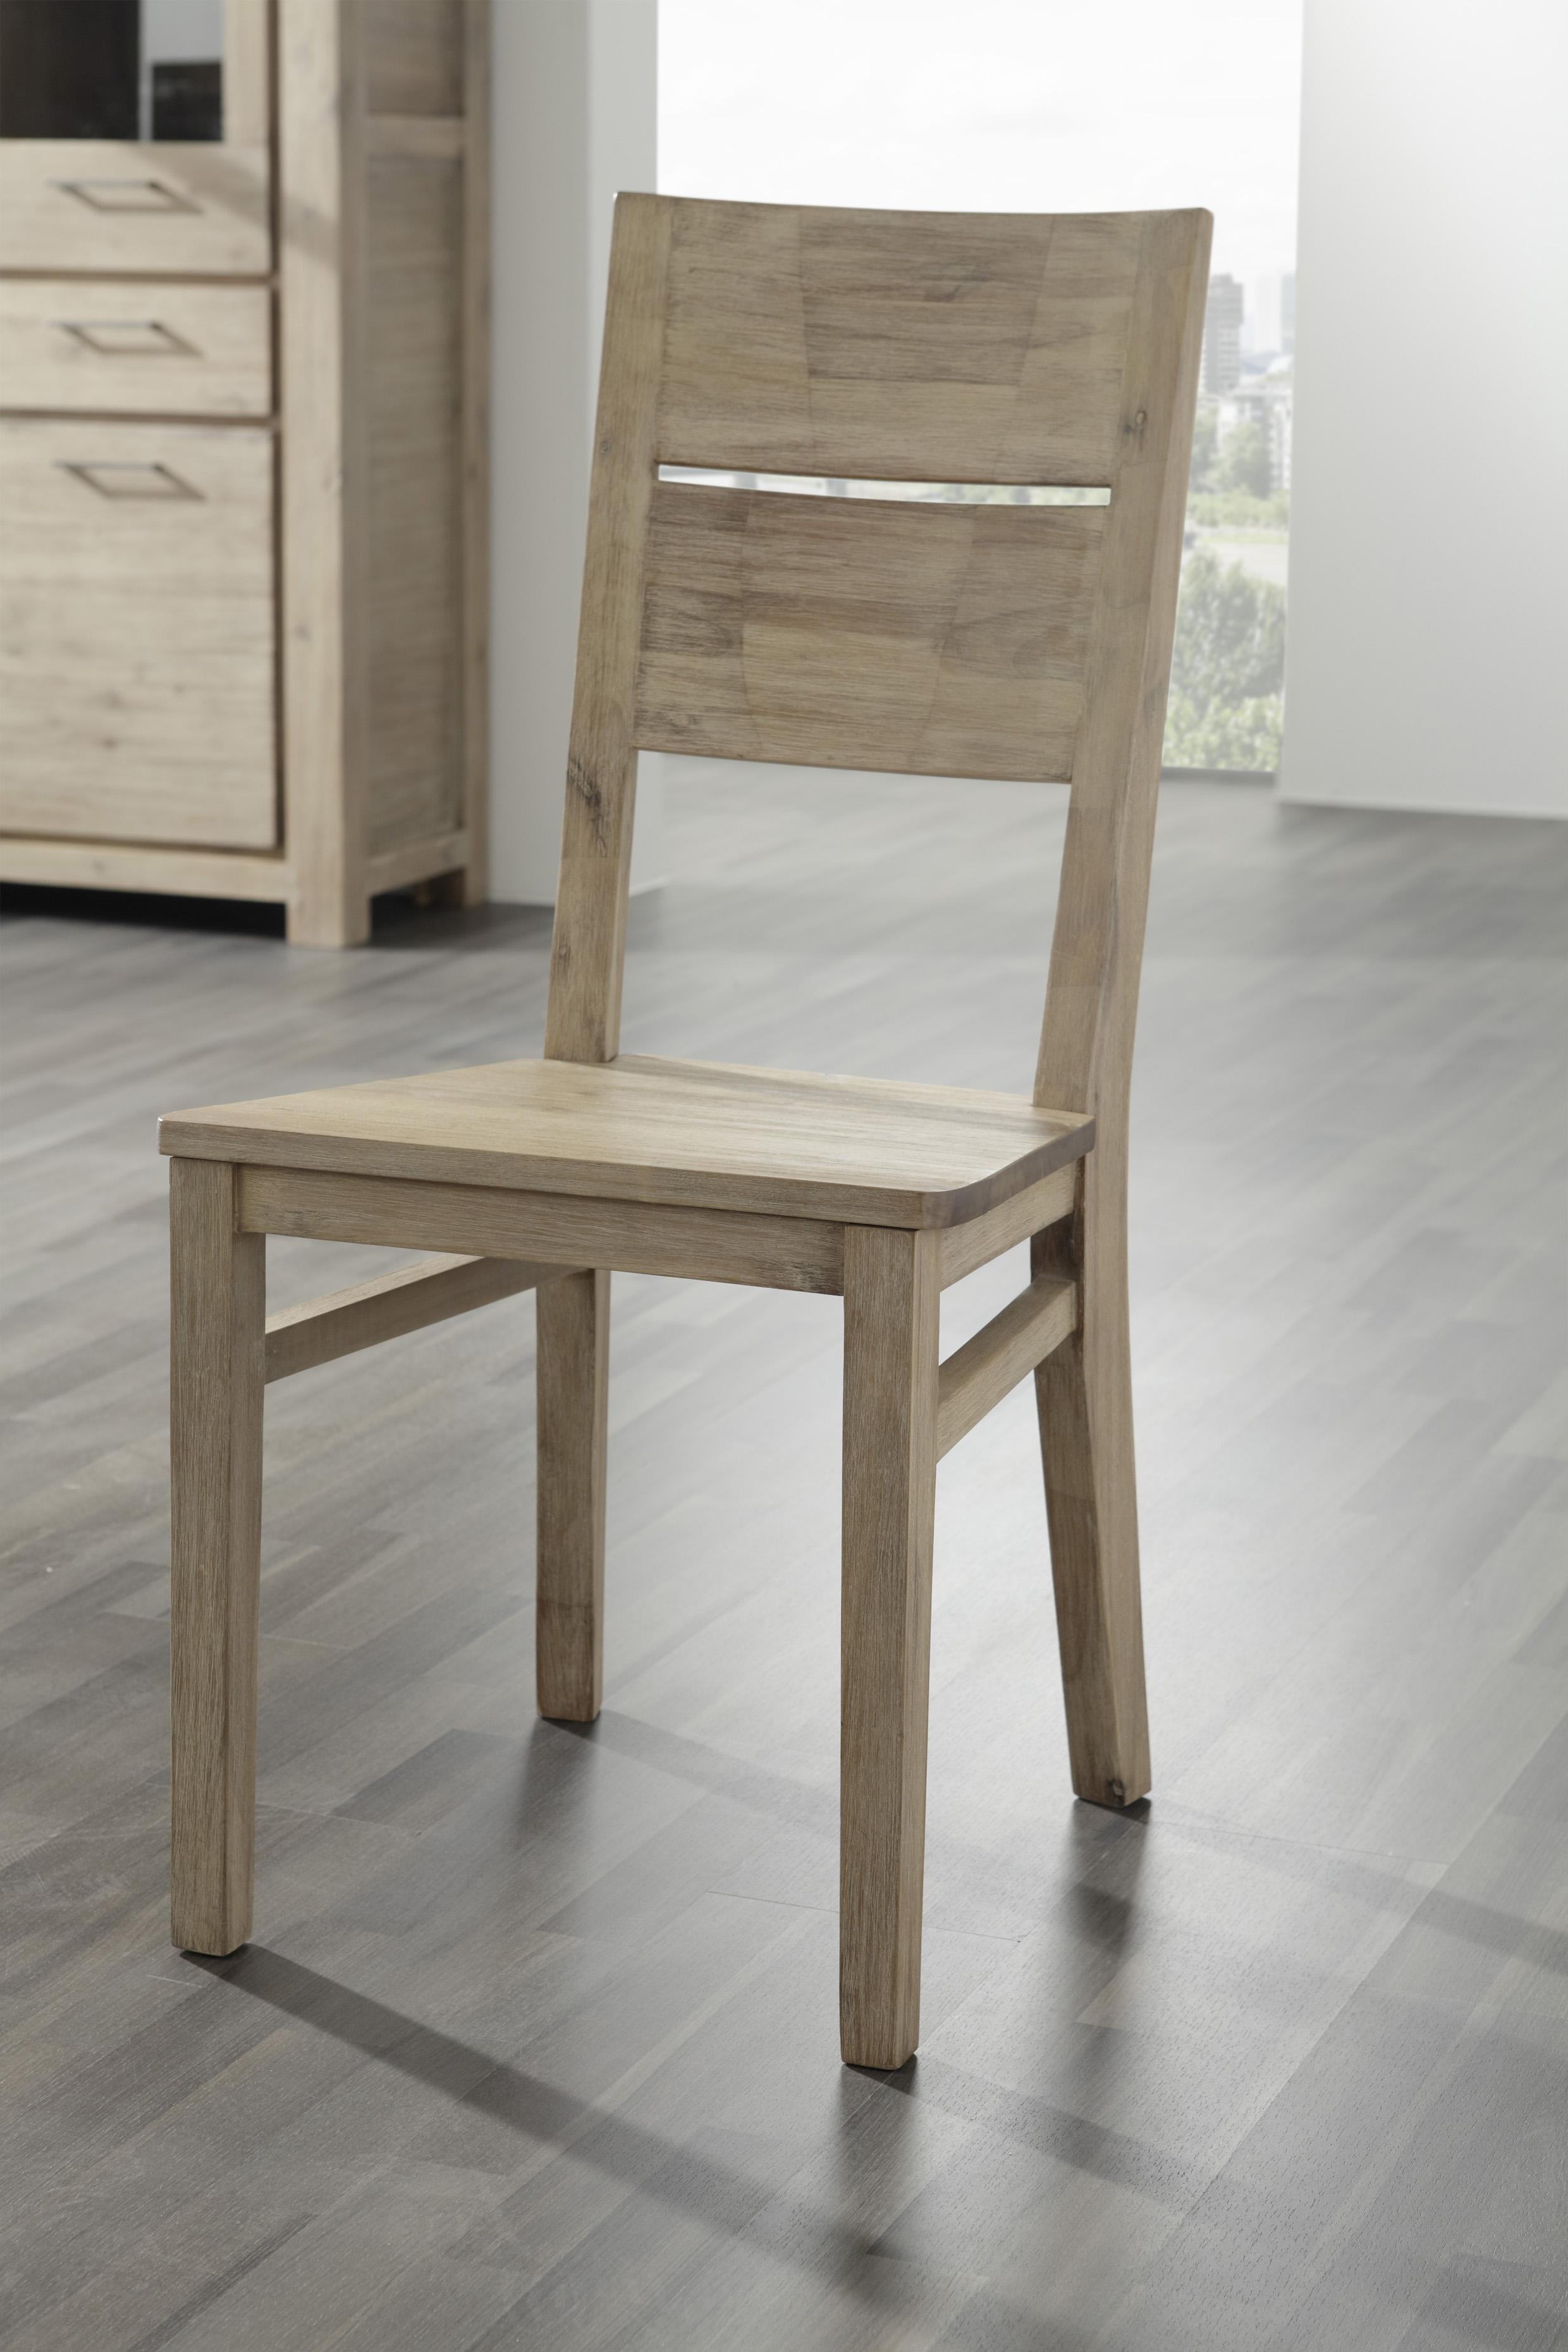 massivholz st hle coast aus akazie im 4er set von wolf m bel ebay. Black Bedroom Furniture Sets. Home Design Ideas